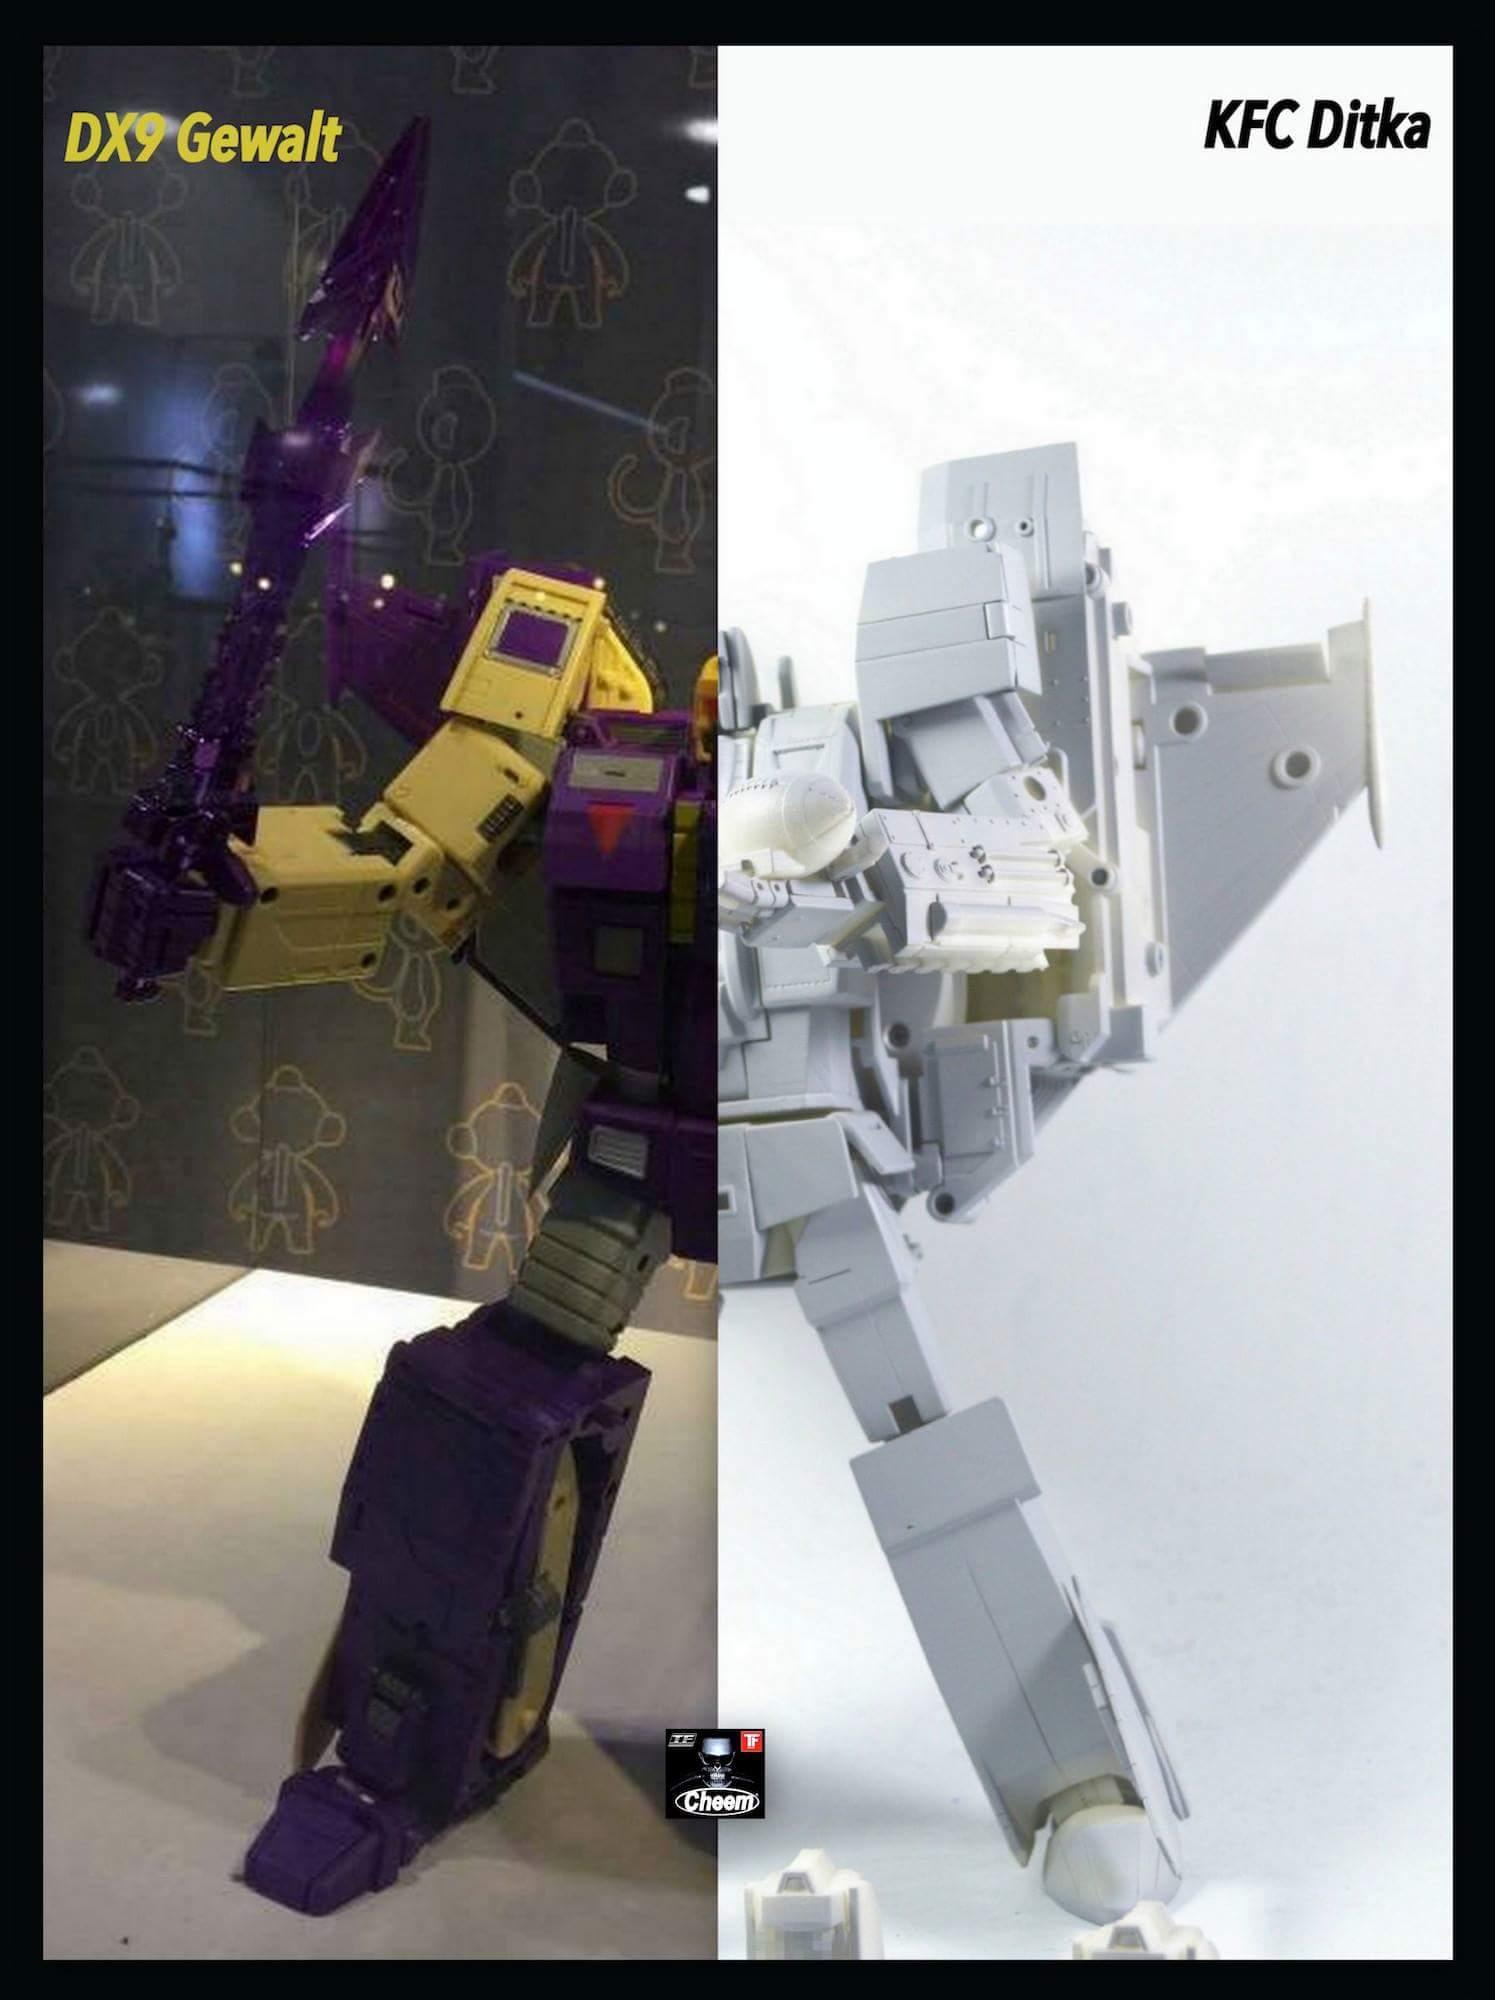 [DX9 Toys] Produit Tiers D-08 Gewalt - aka Blitzwing/Le Blitz QtC0a07b